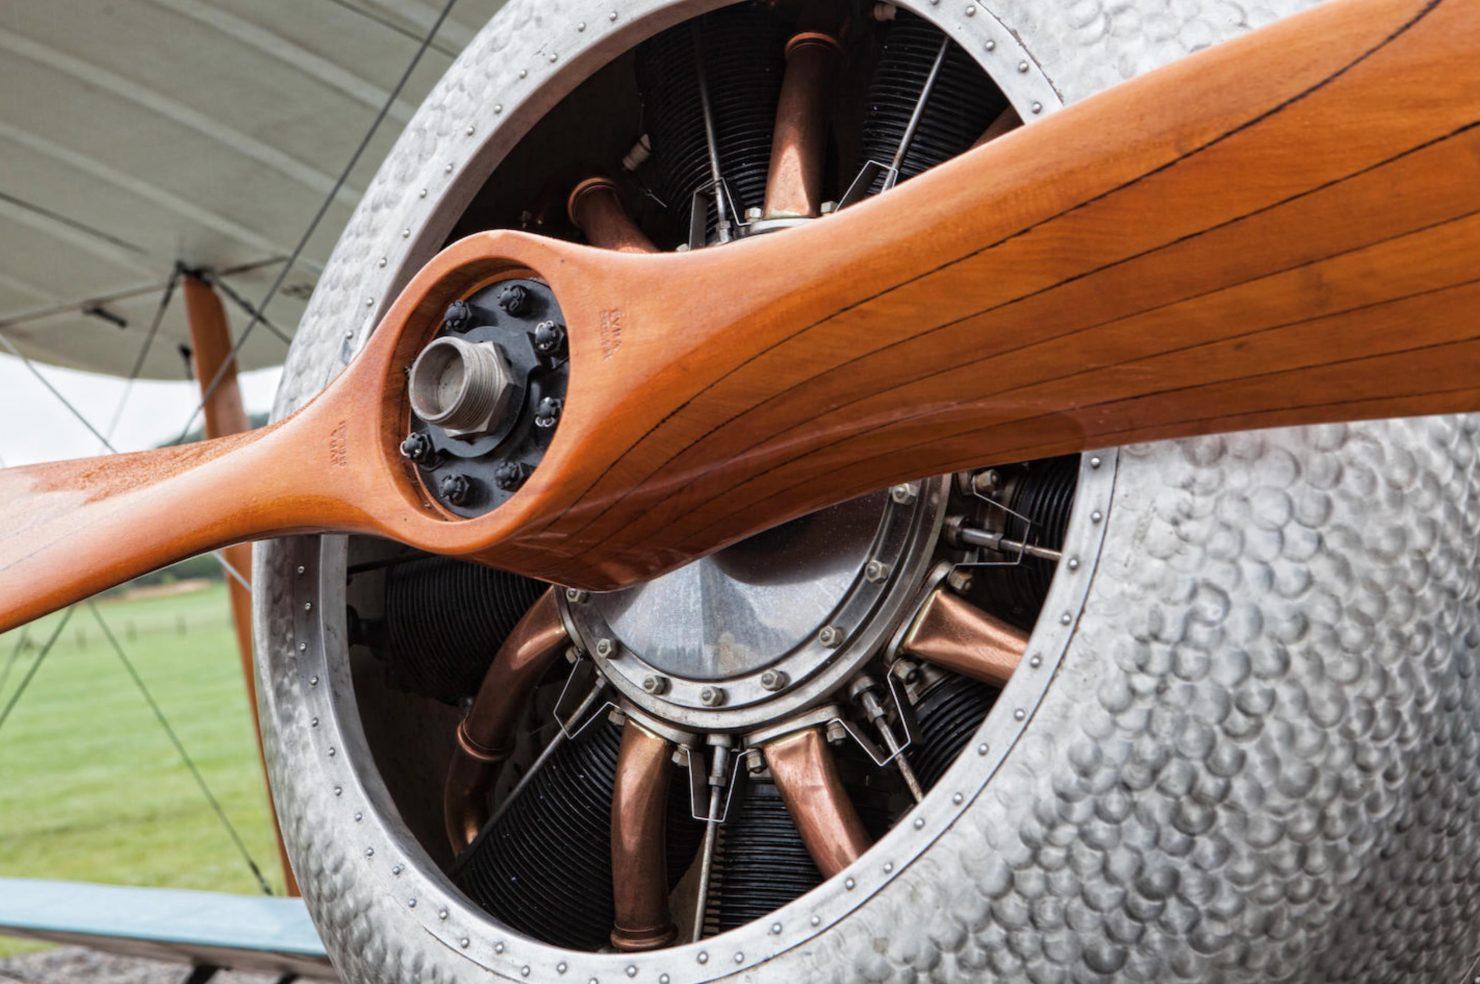 Sopwith Dove 2 1480x984 - Sopwith Dove Biplane